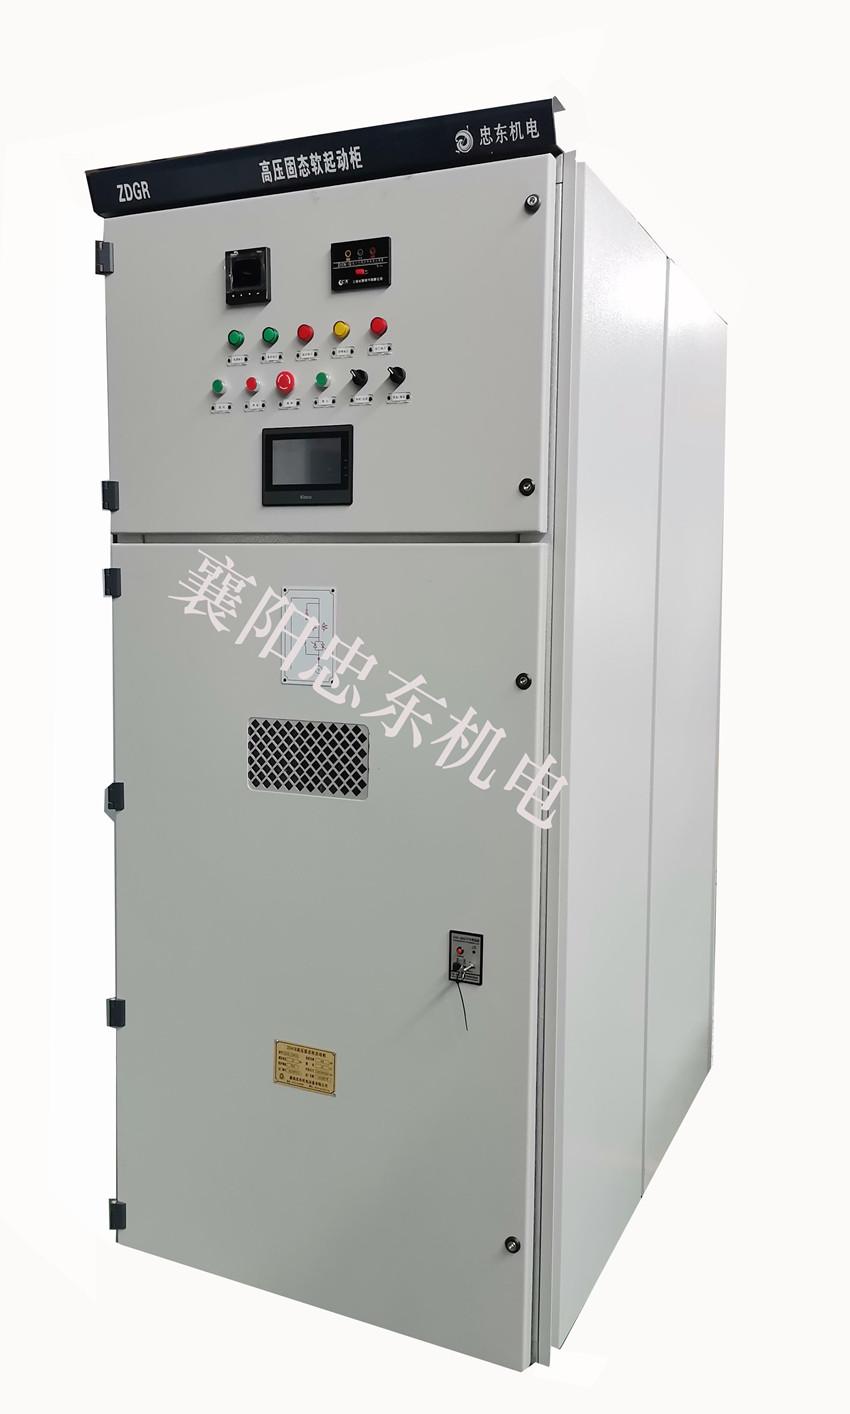 ZDGR系列高压固态软启动柜